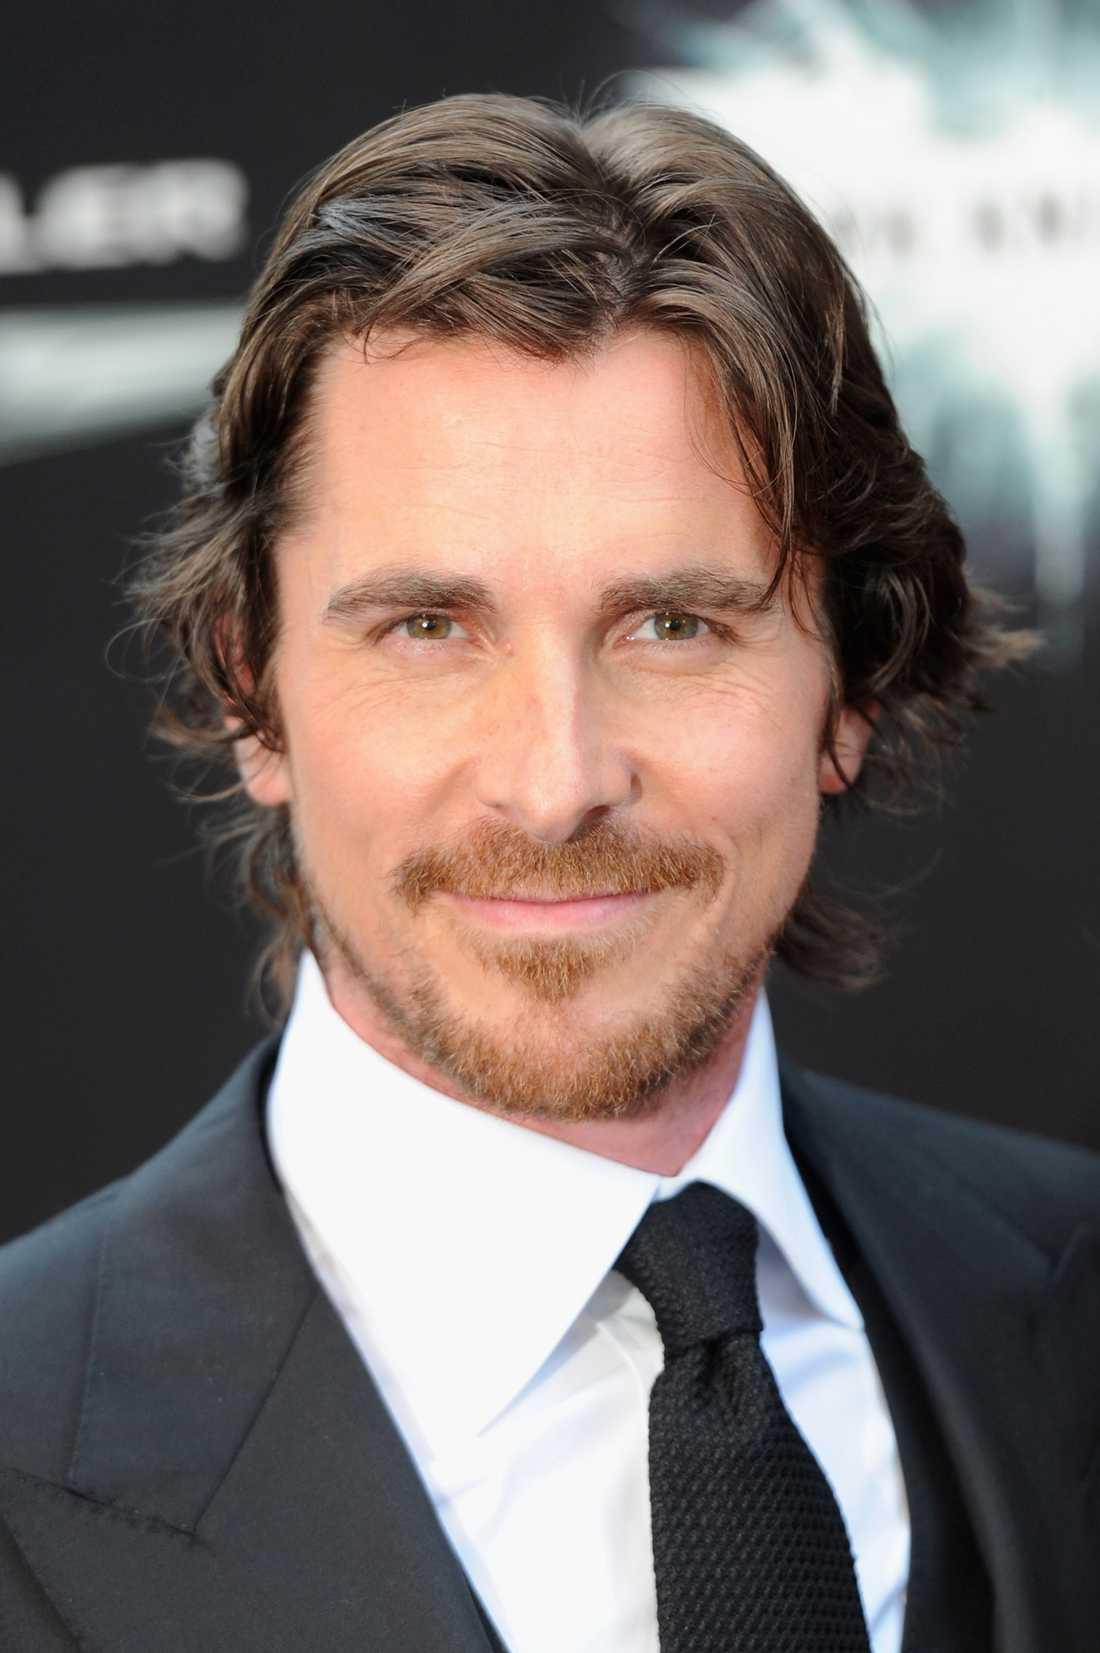 Christian Bale som spelar Batman himself.